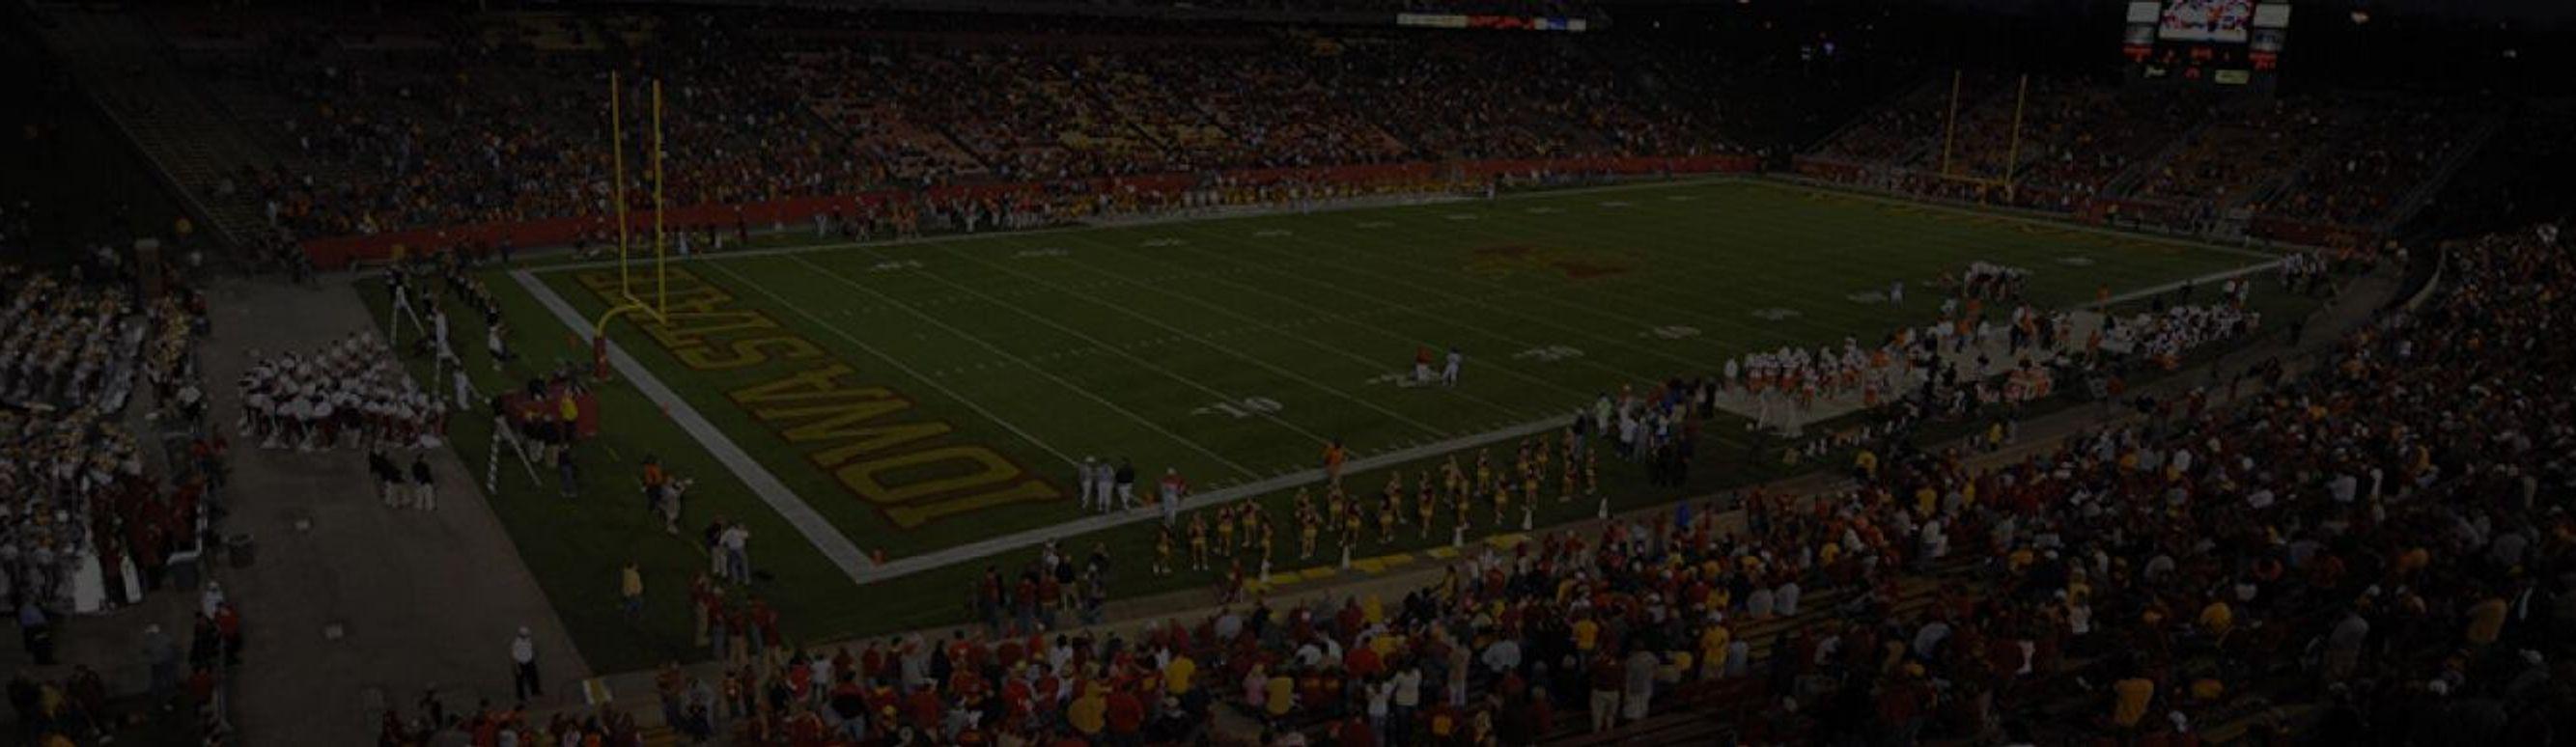 Jack Trice Stadium in Ames, Iowa.